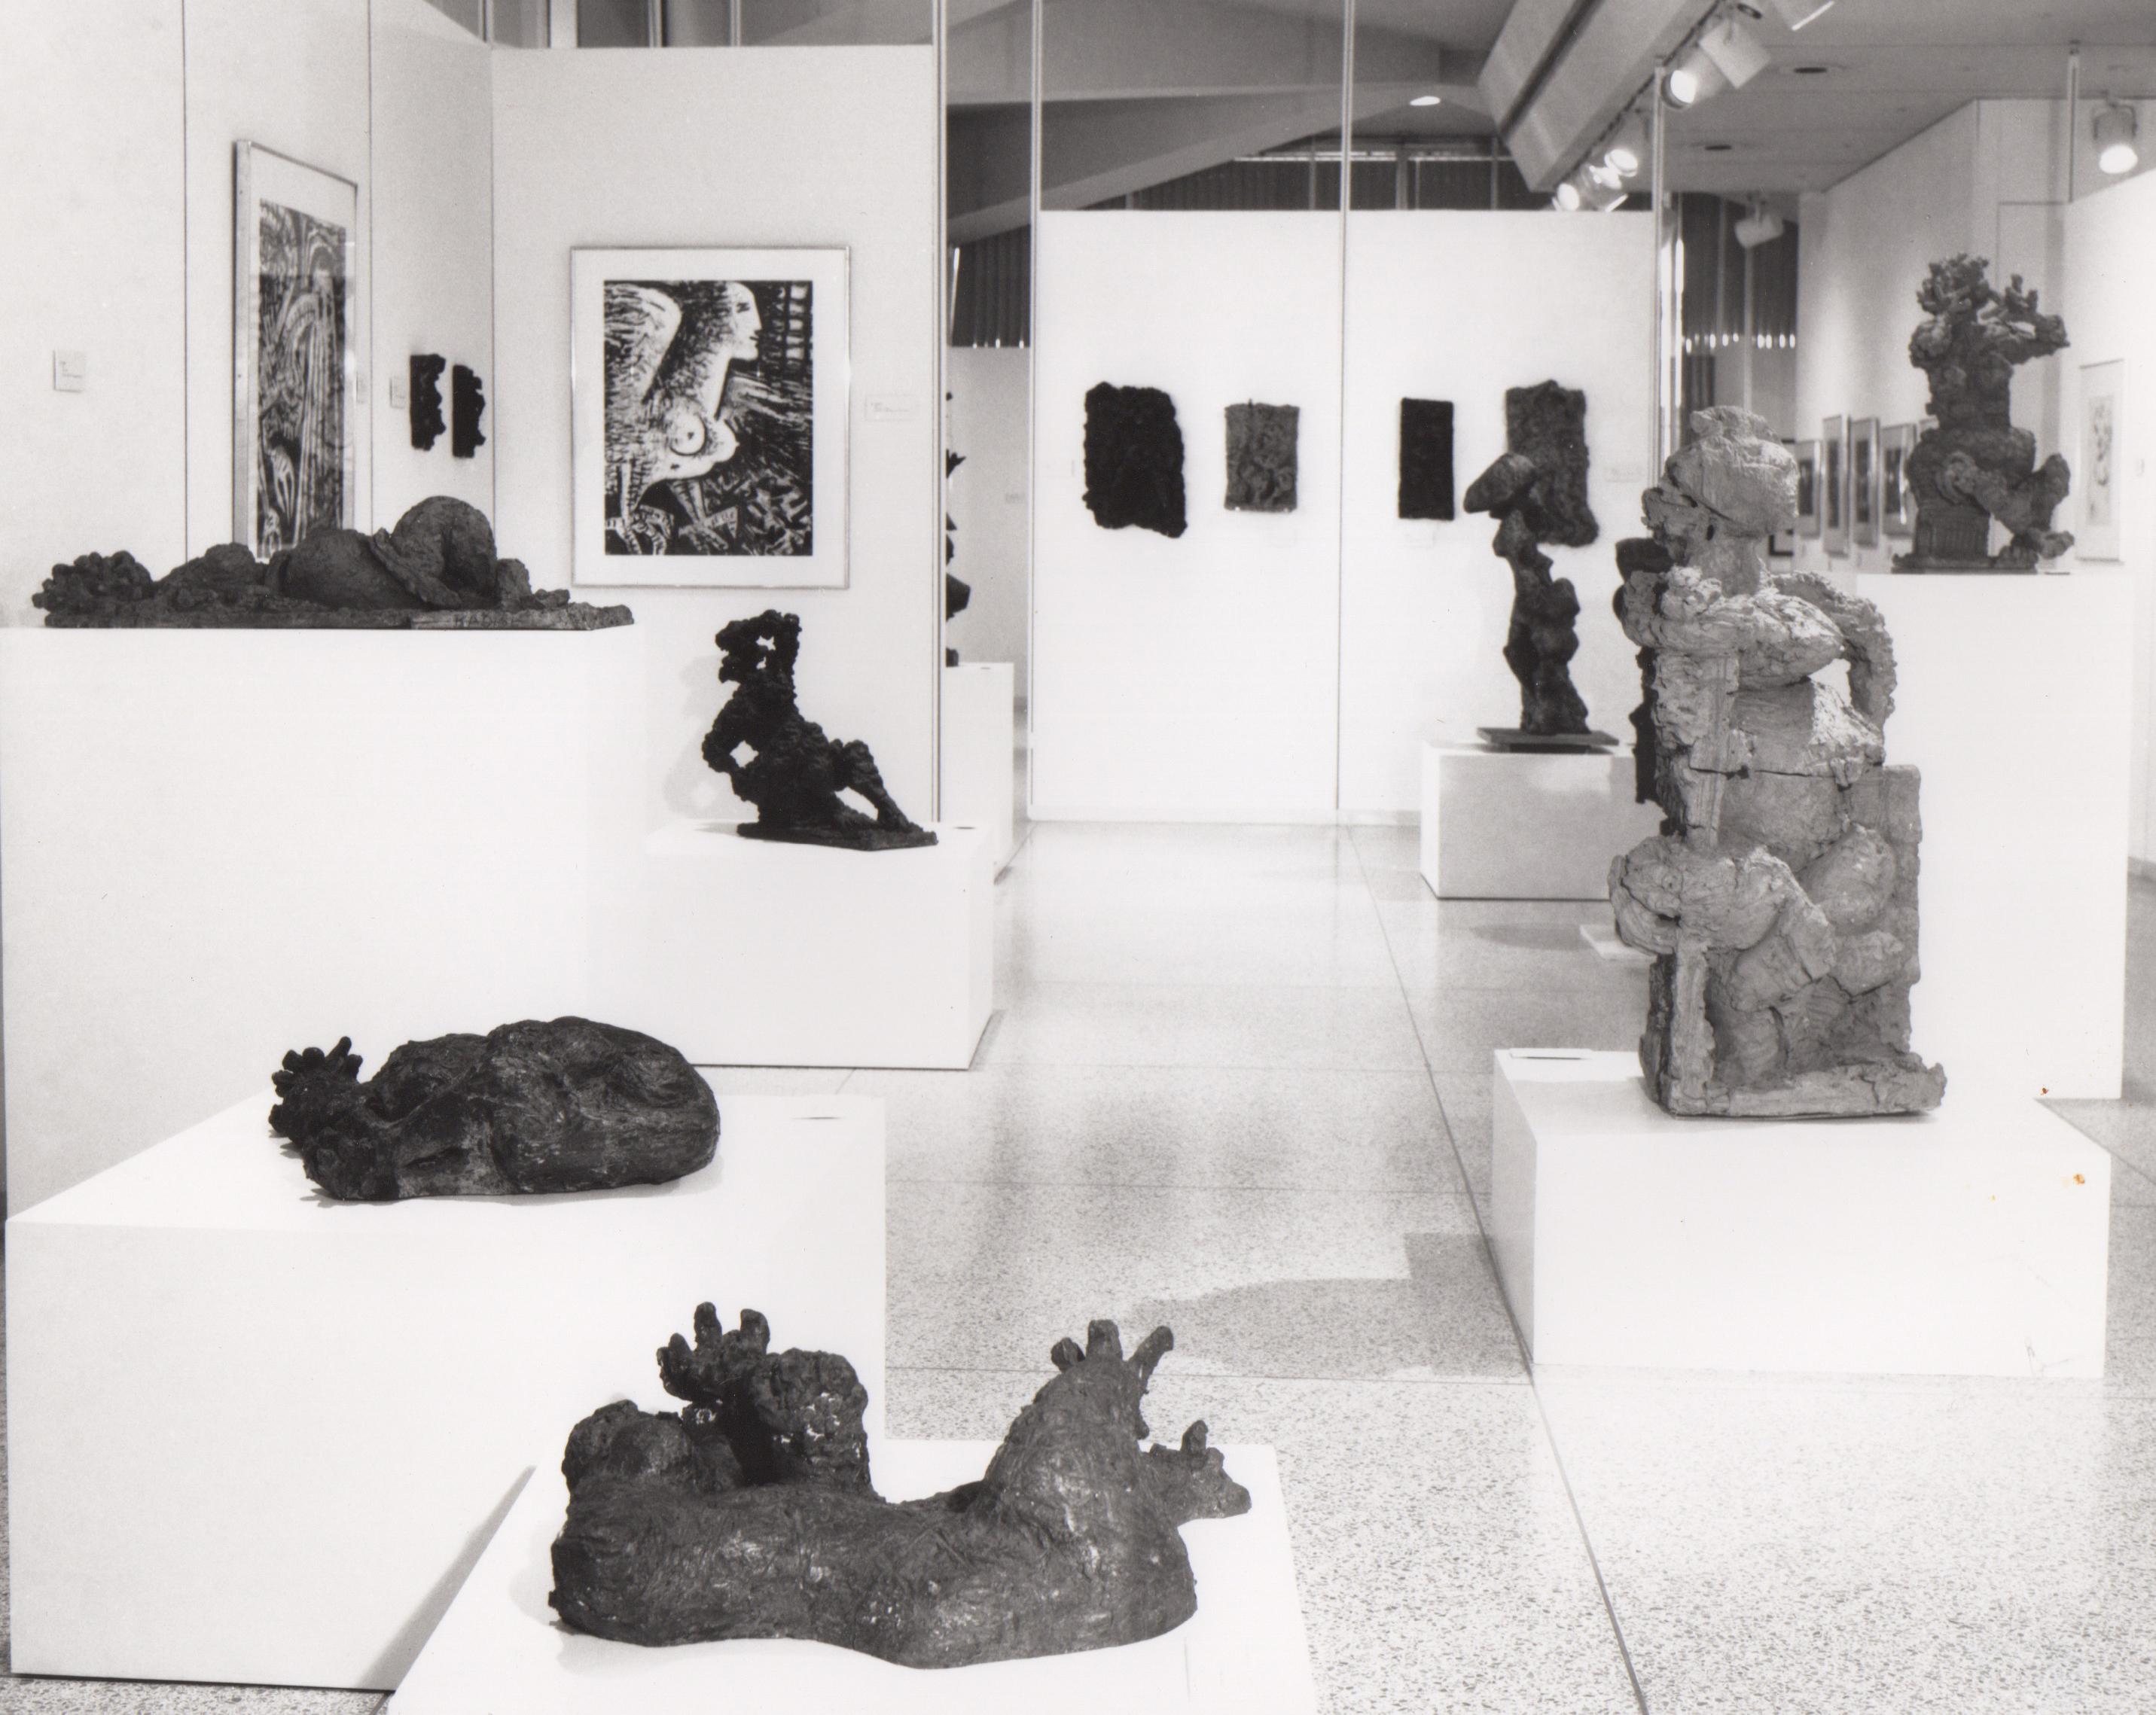 nj_state_museum_2